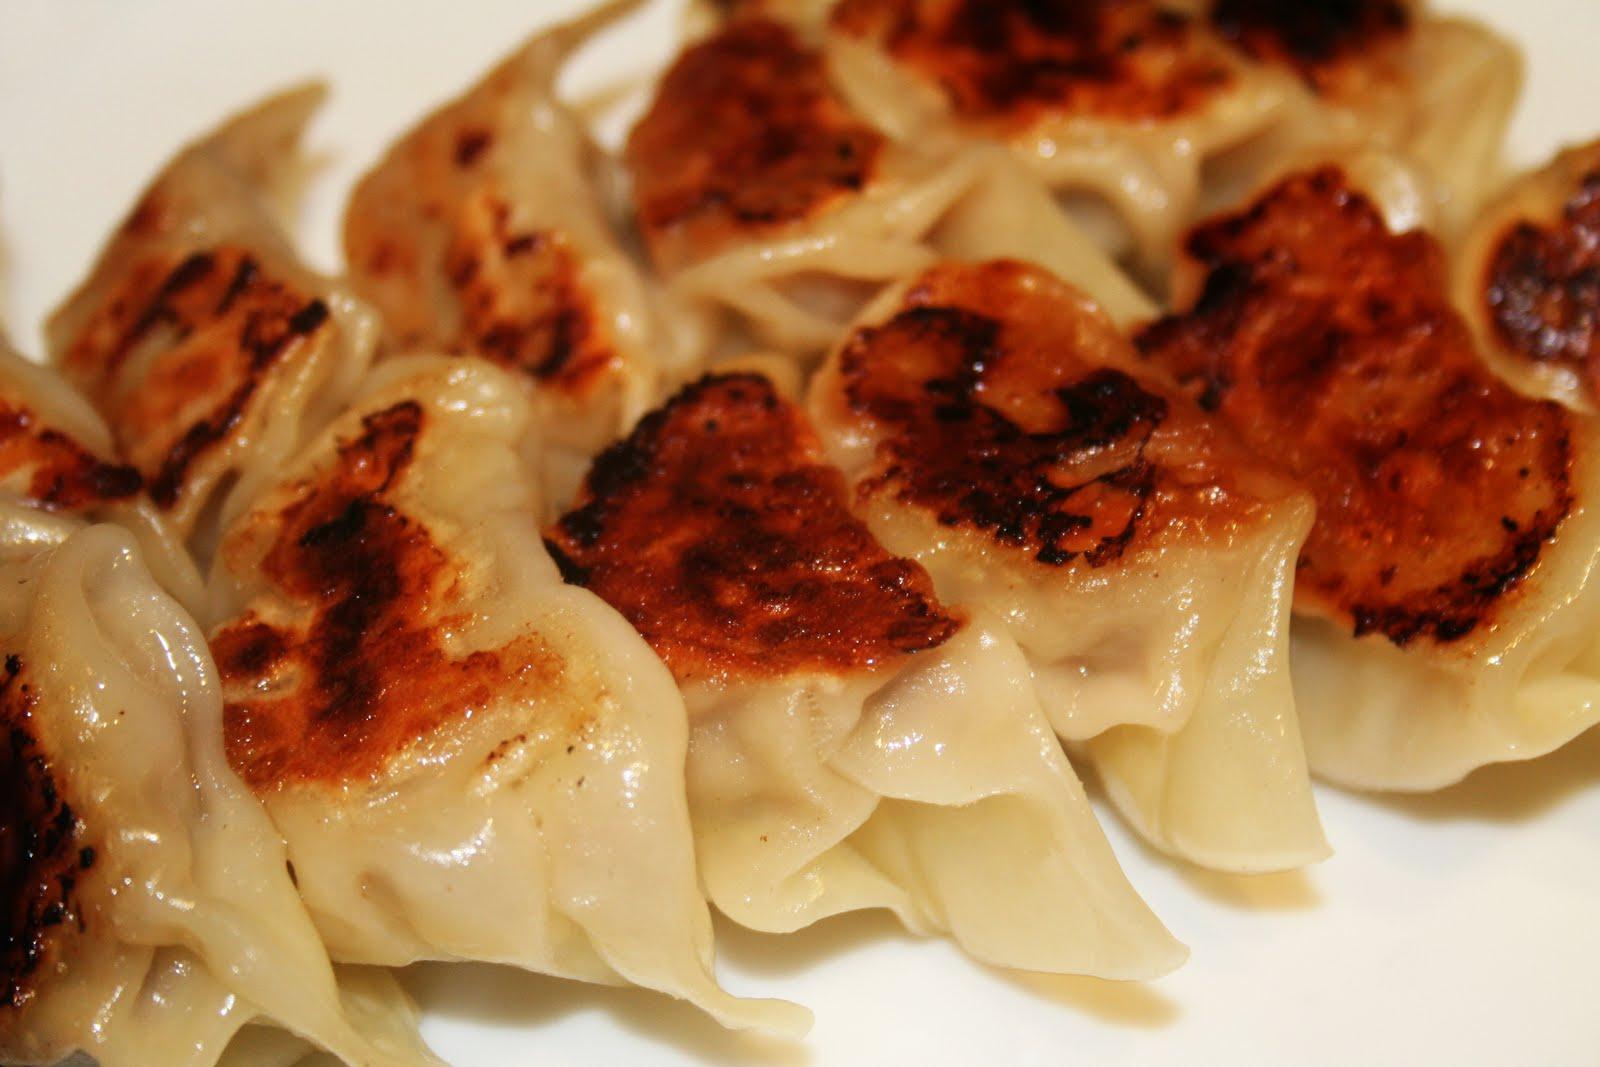 La cuisine de bernard tokyo - La cuisine de berbard ...